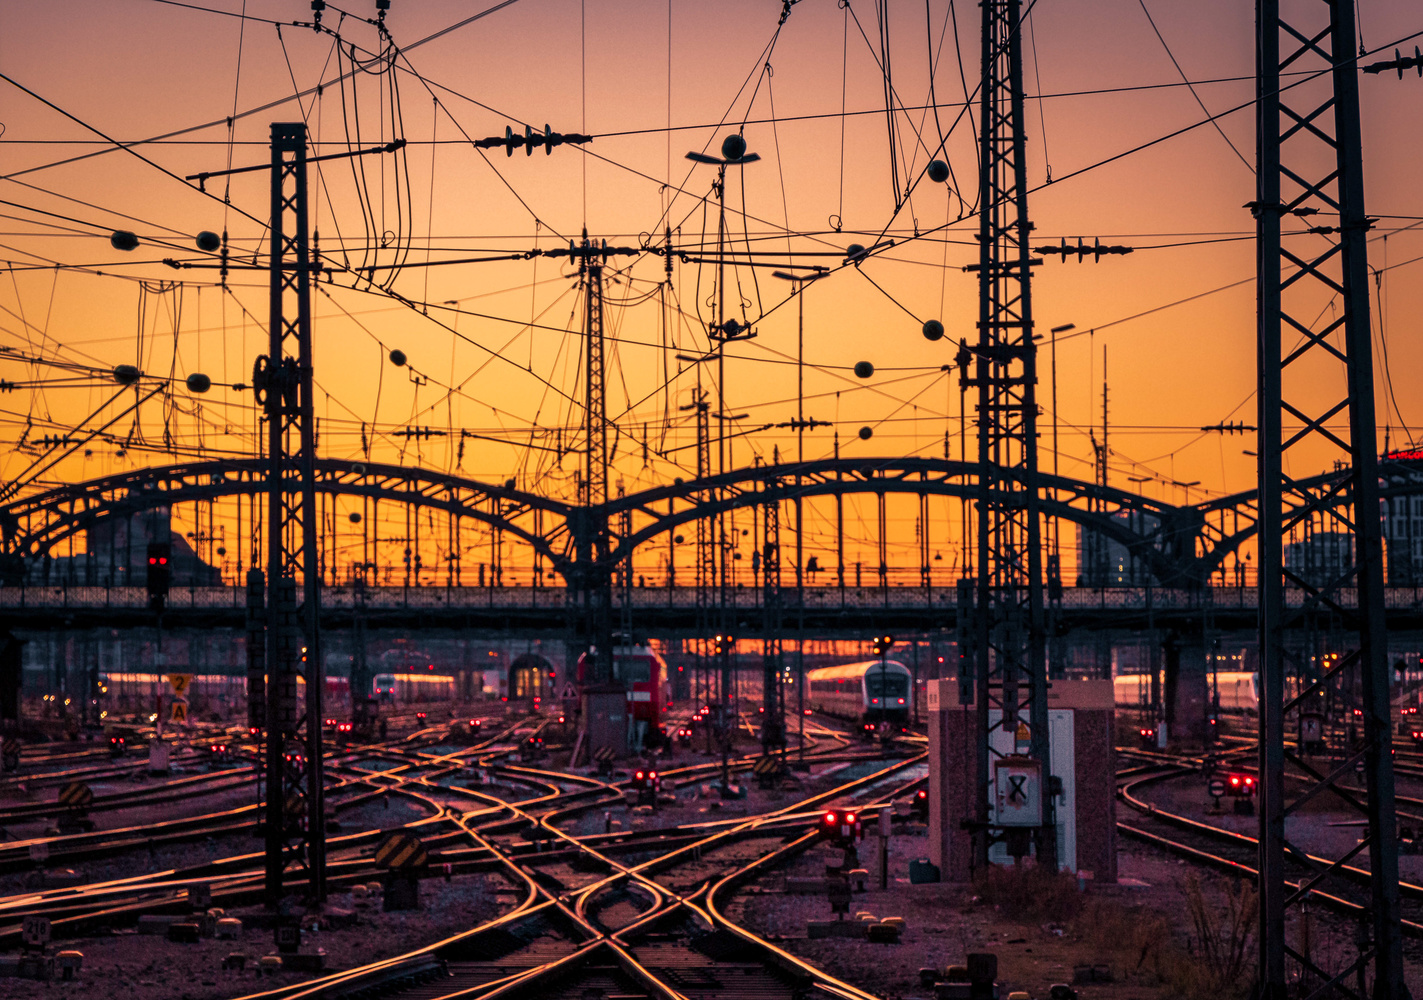 Hackerbrücke by Alex K